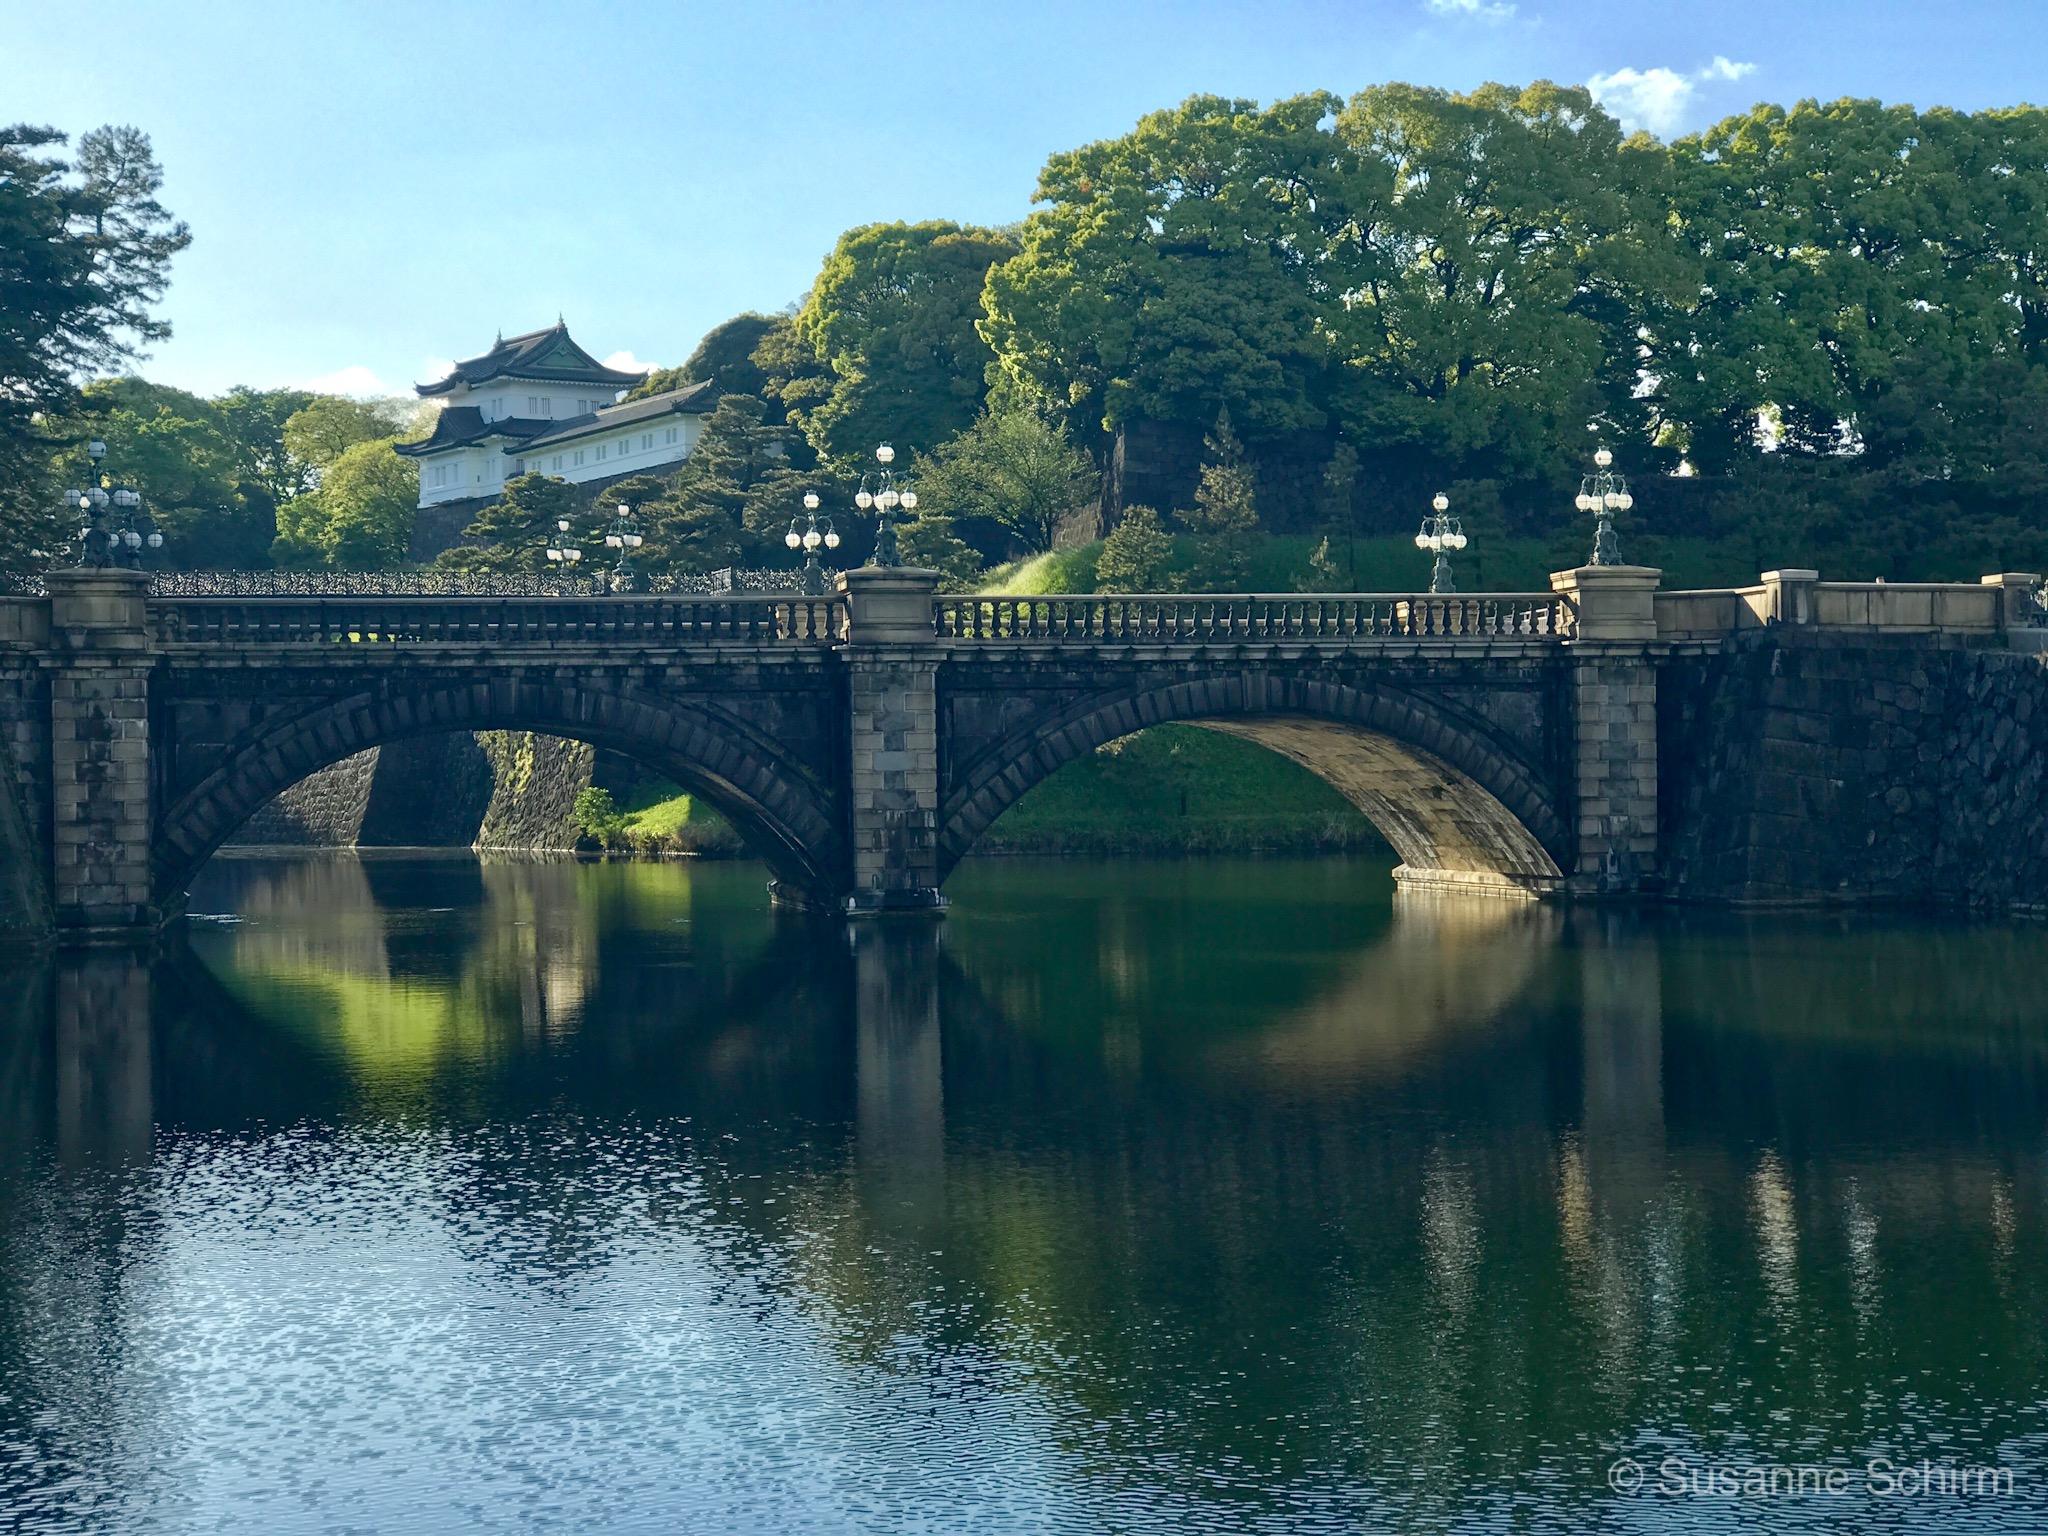 Seimon-ishibashi Brücke am Kaiserpalast in Tokio